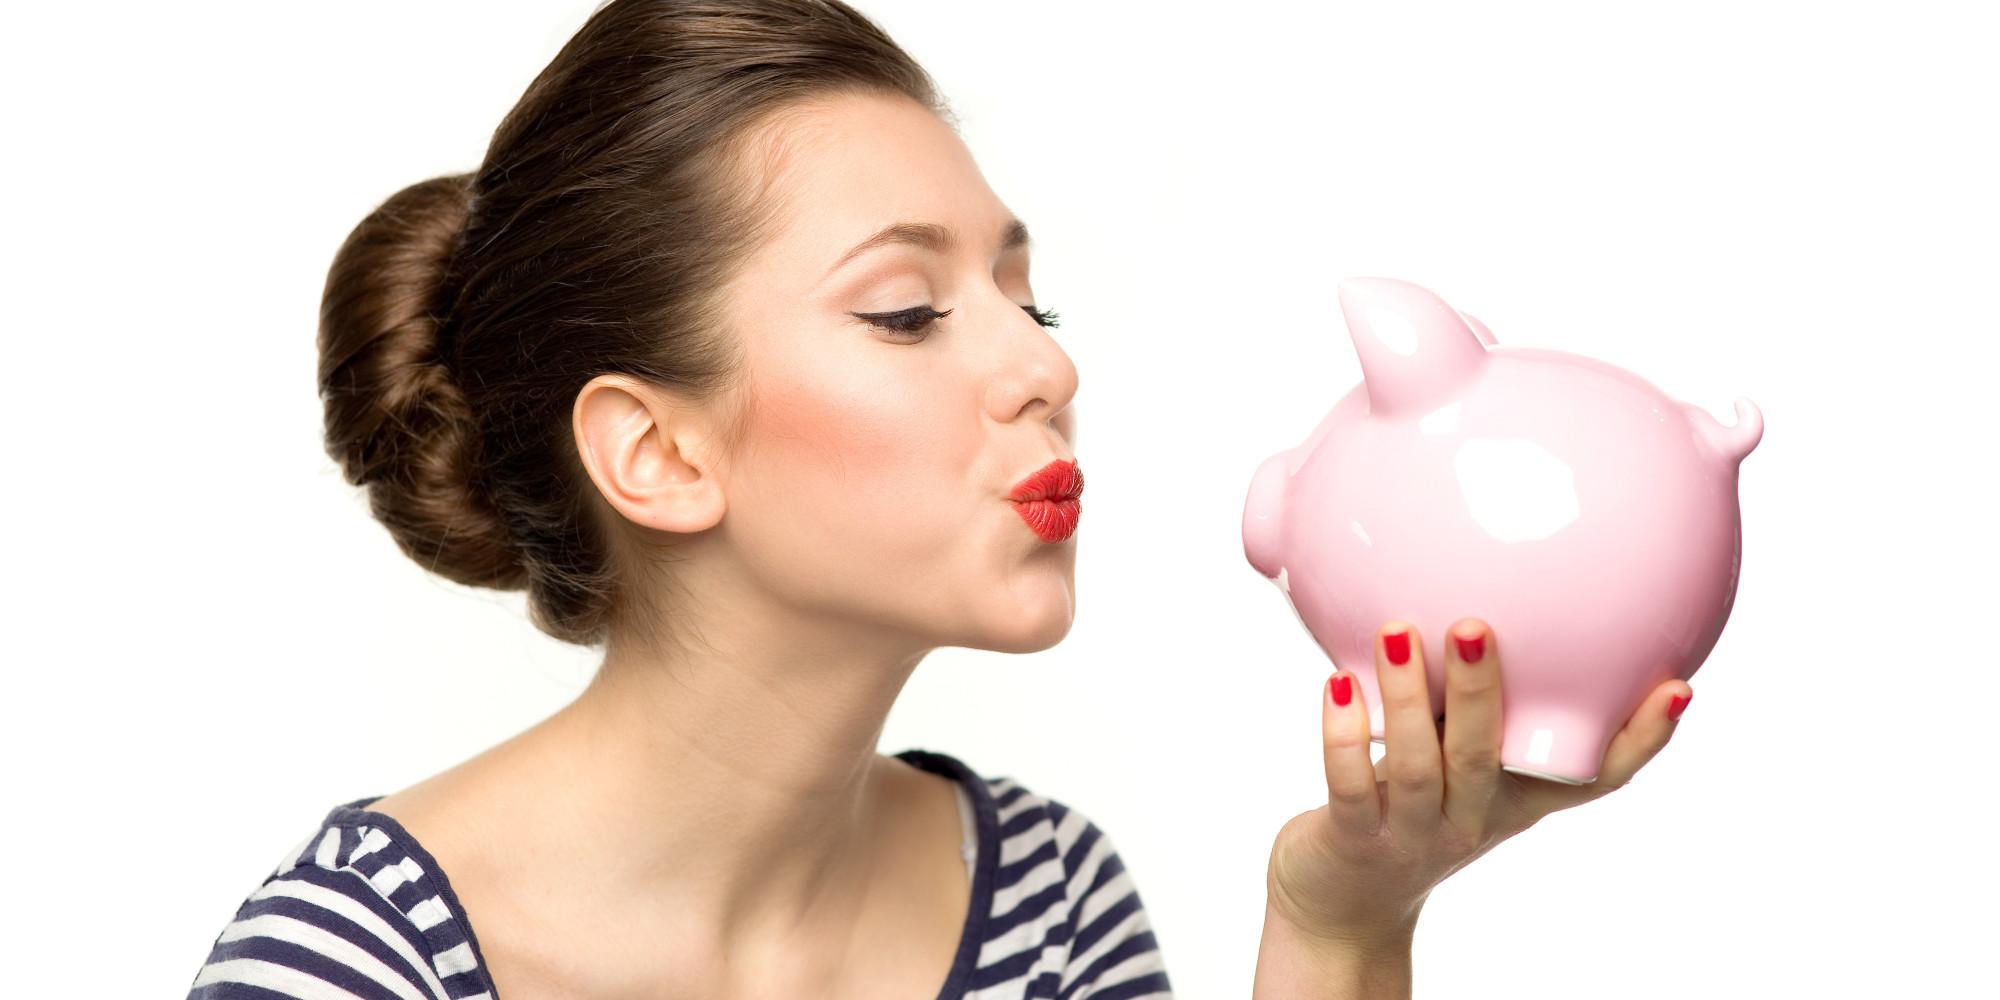 o-women-money-facebook.jpg